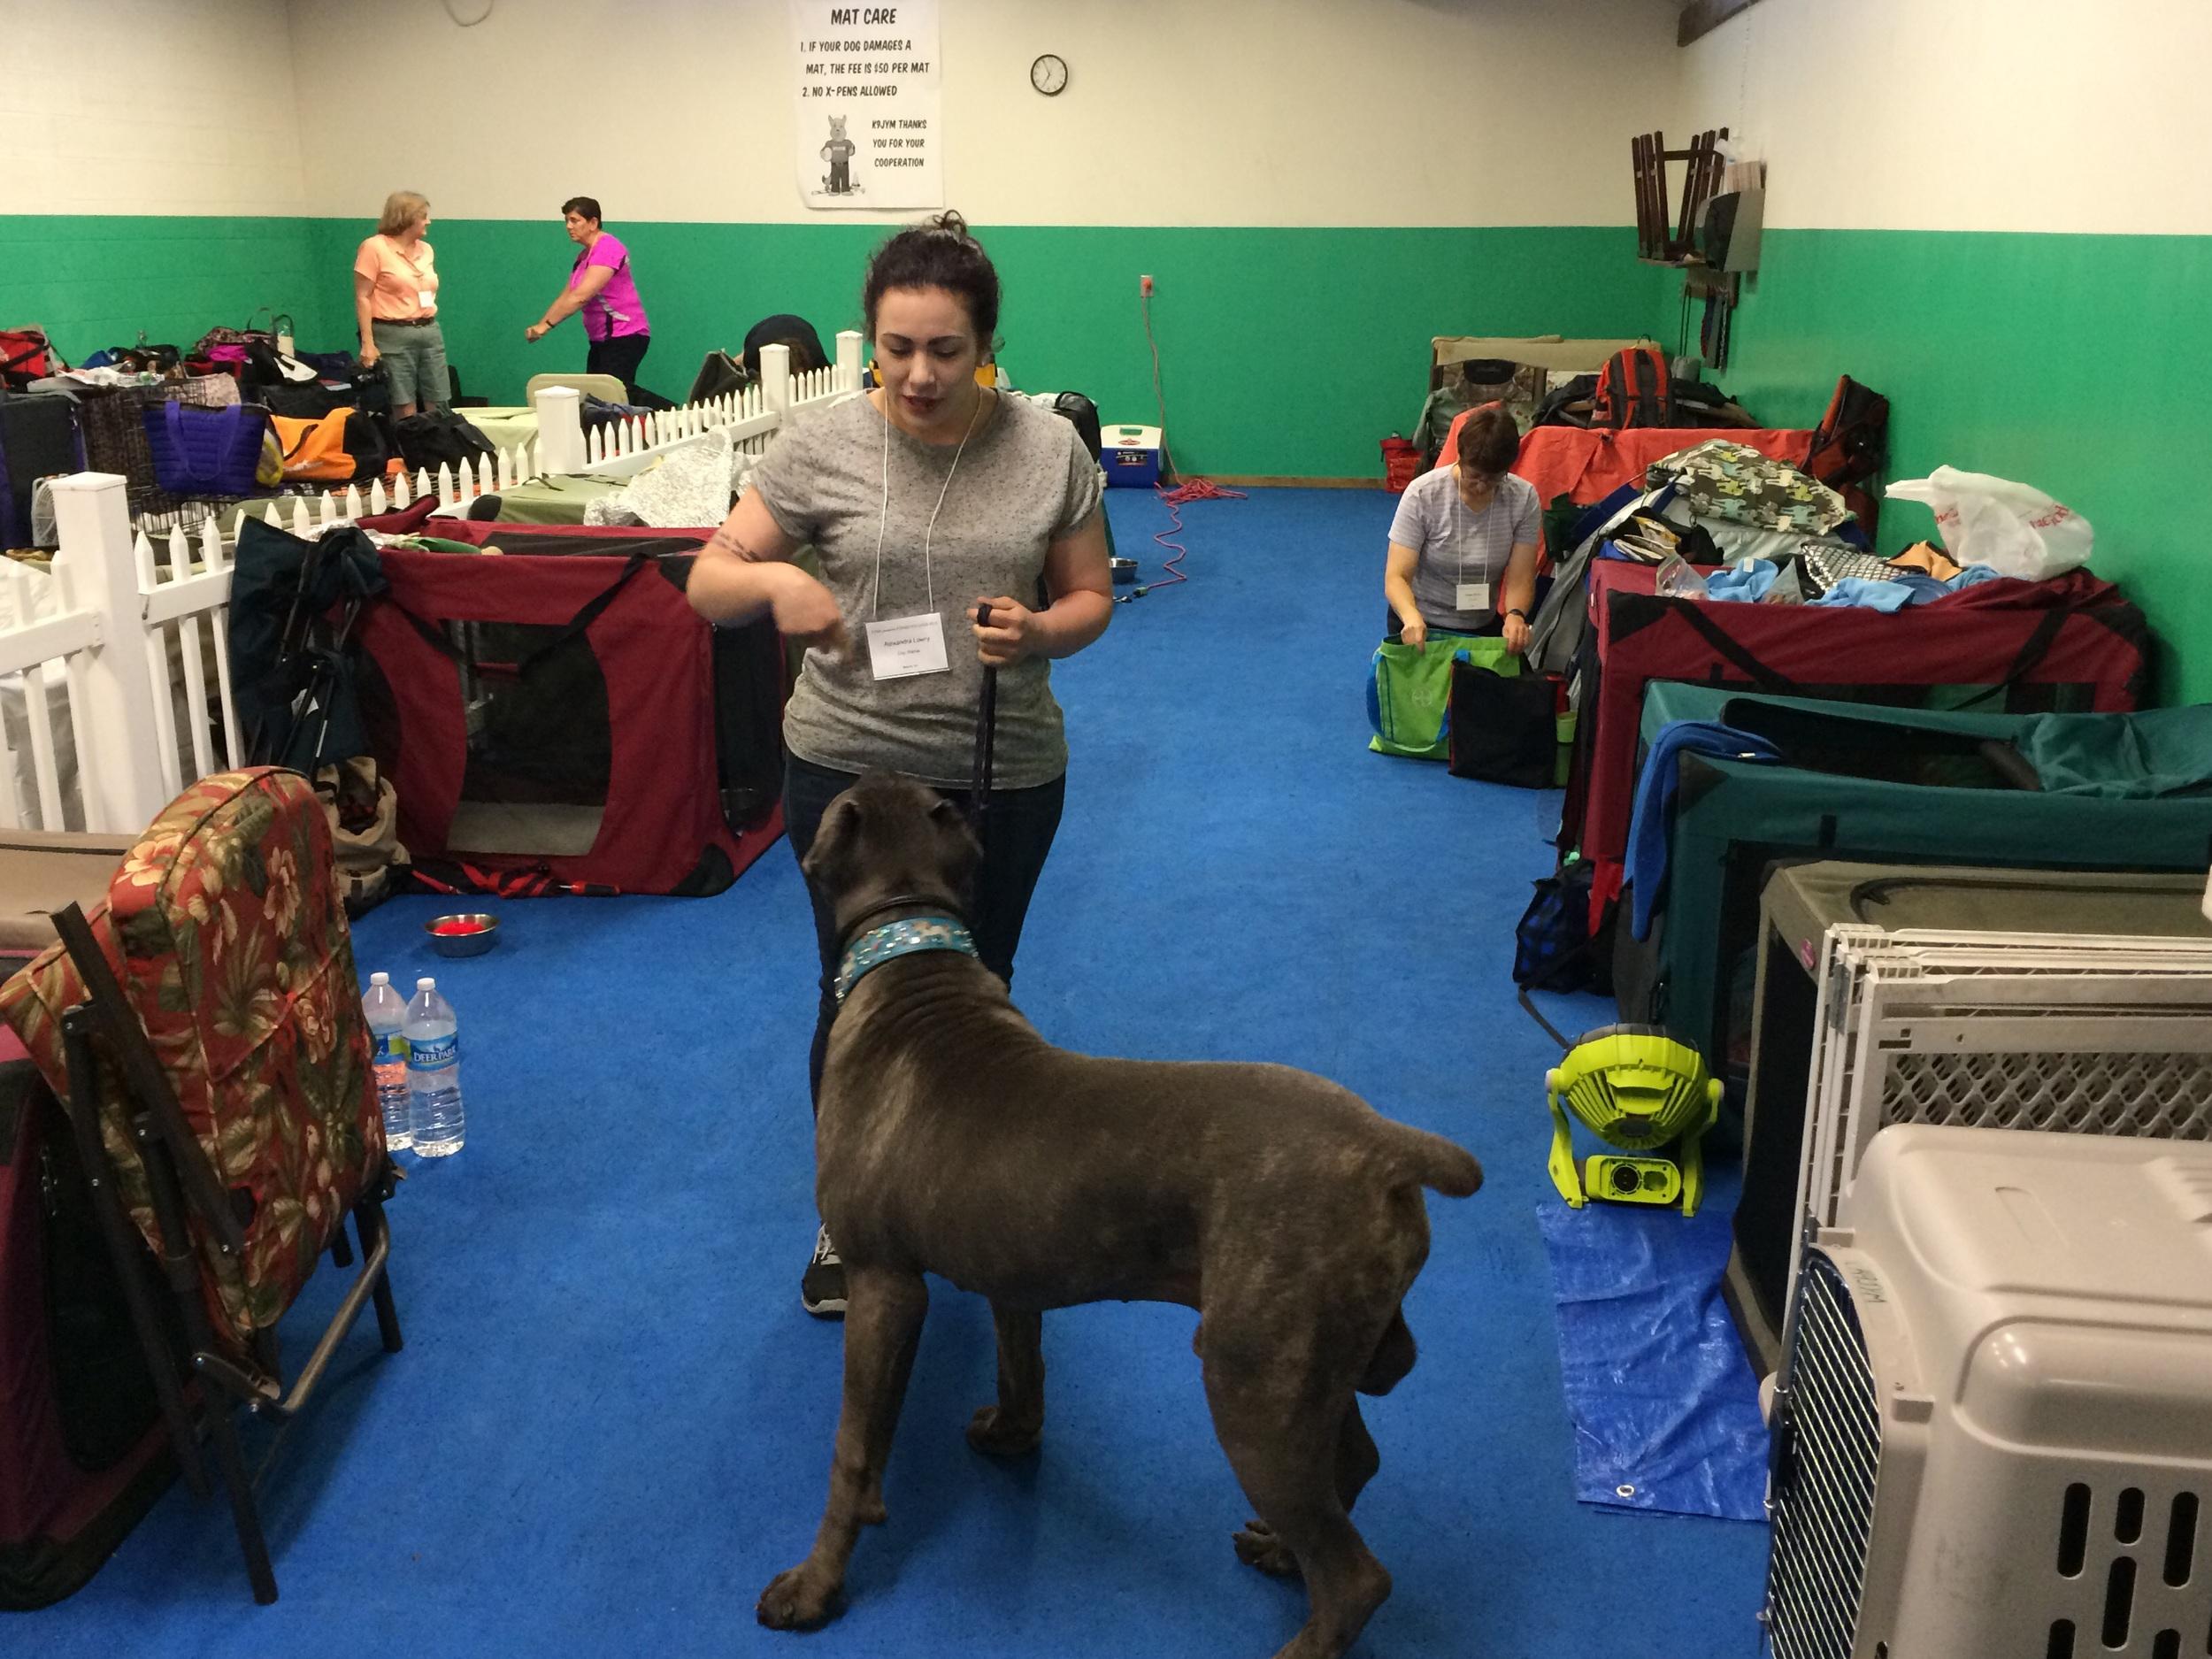 Big dogs love to work too!